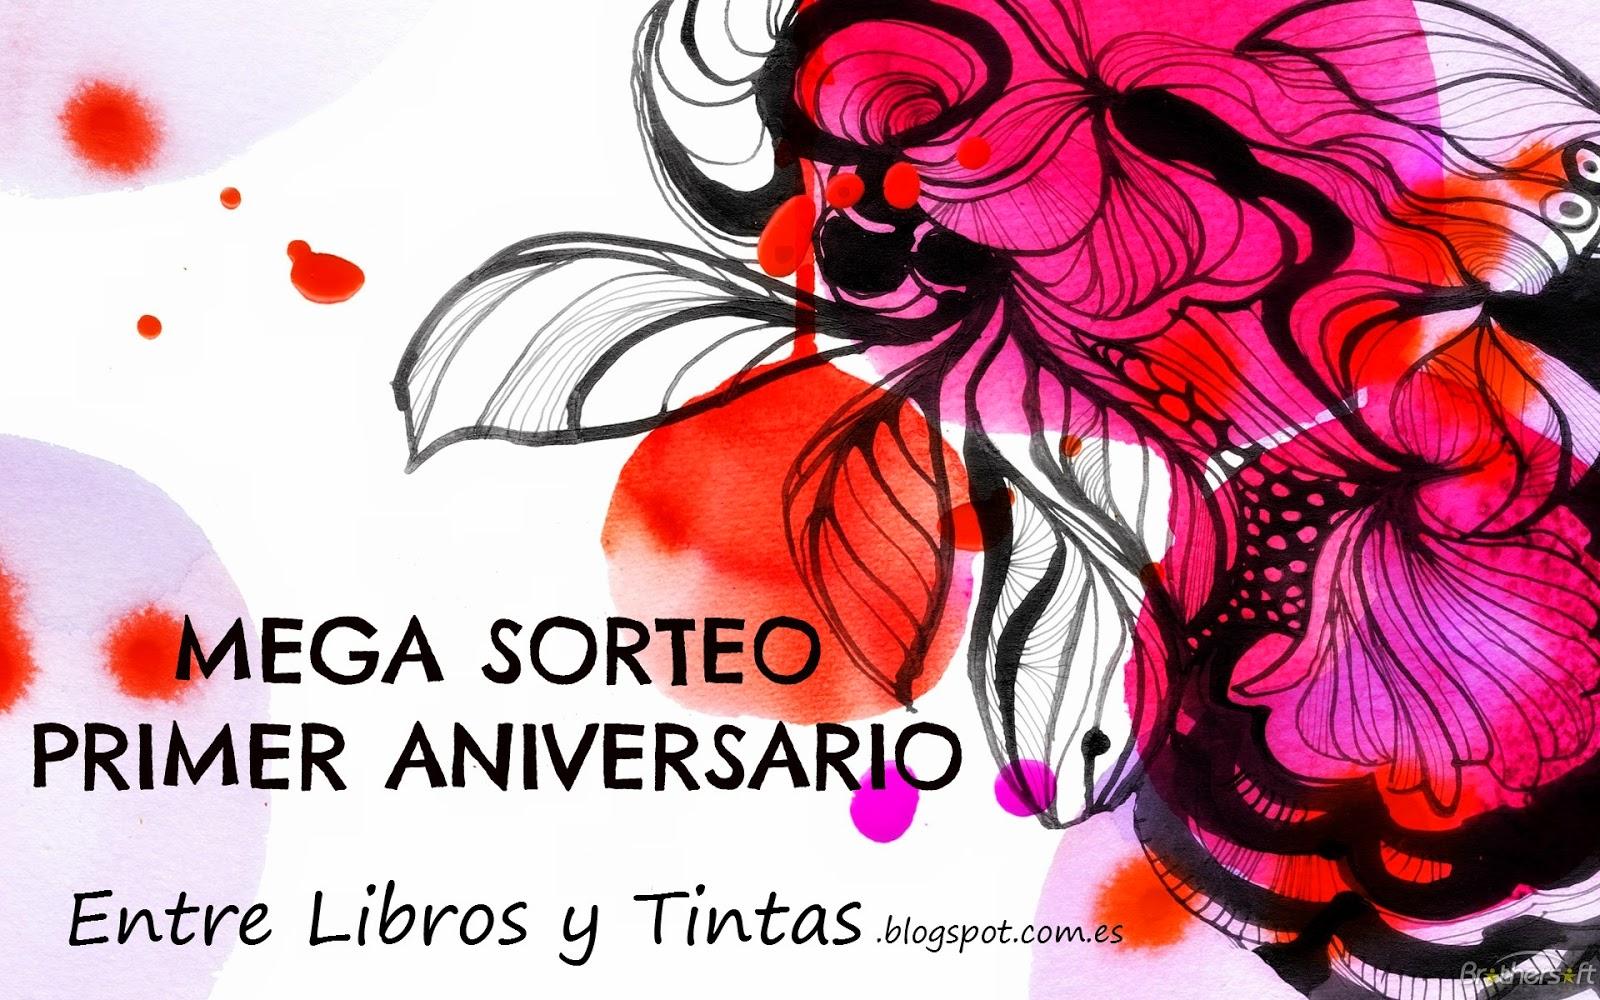 http://entrelibrosytintas.blogspot.com.es/2015/04/mega-sorteo-primer-aniversario-de-entre.html